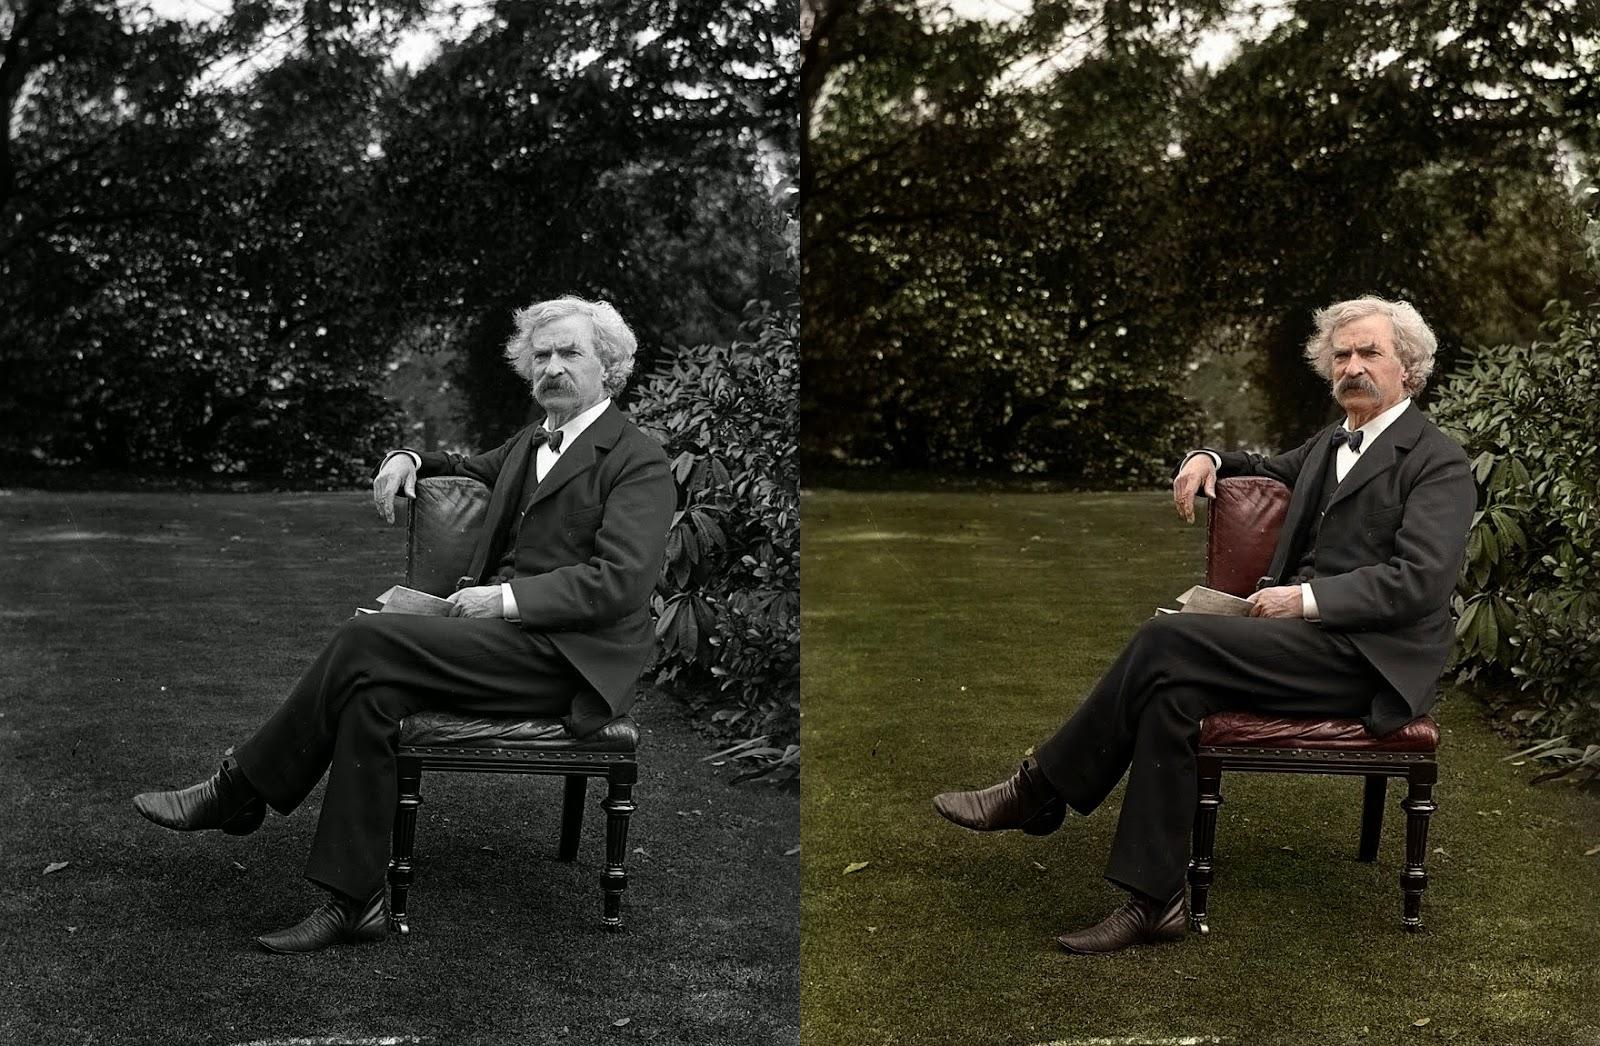 Mark Twain garden pic